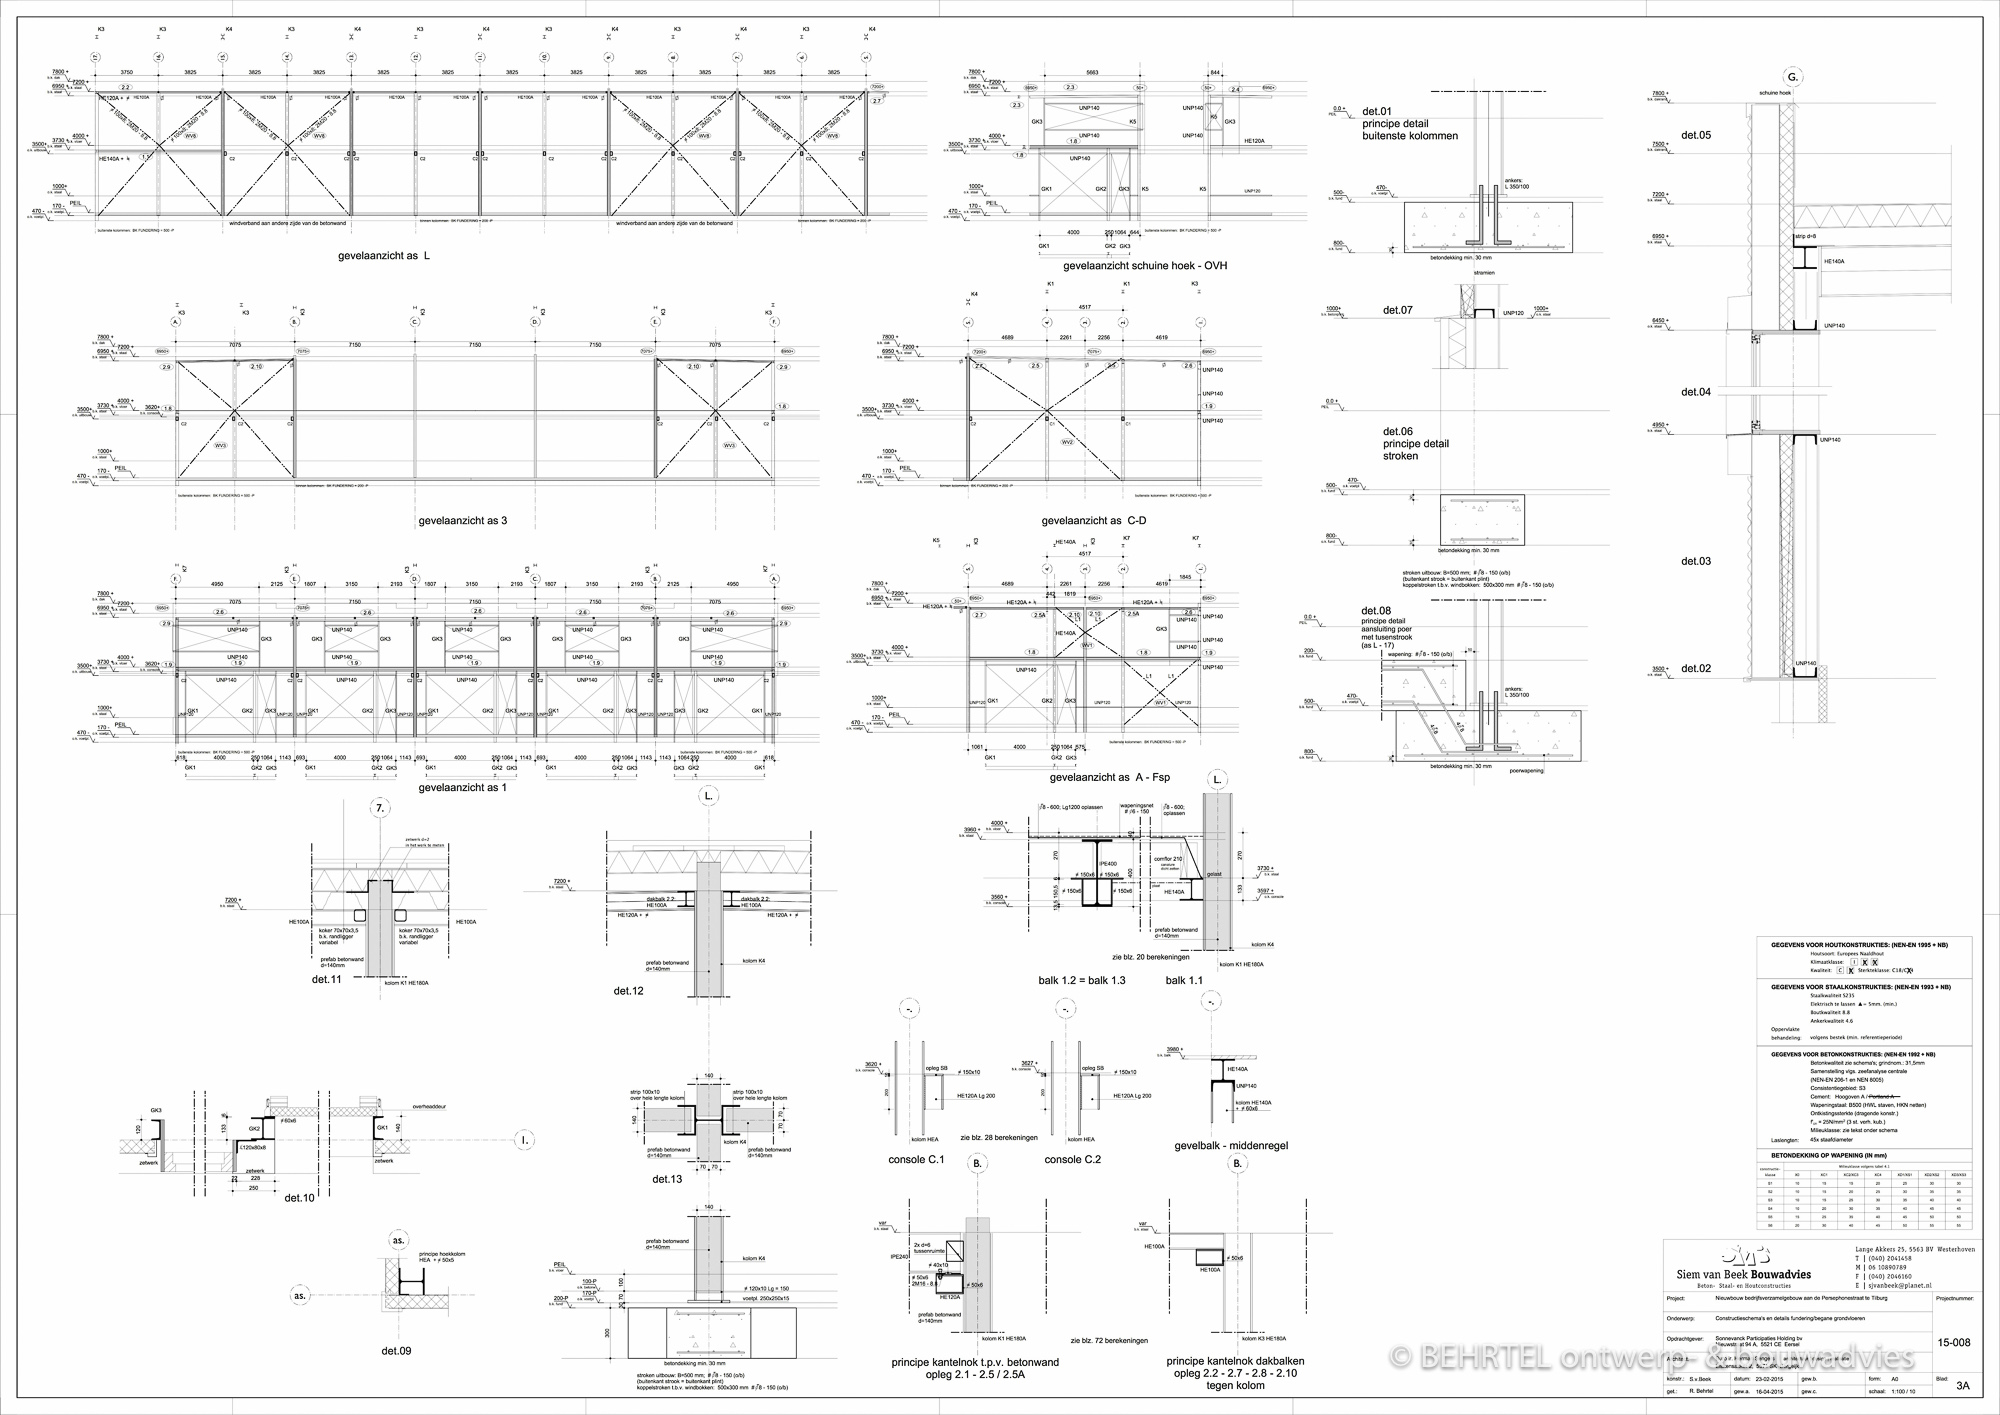 p15-001-constr-tek-editie-a-017a